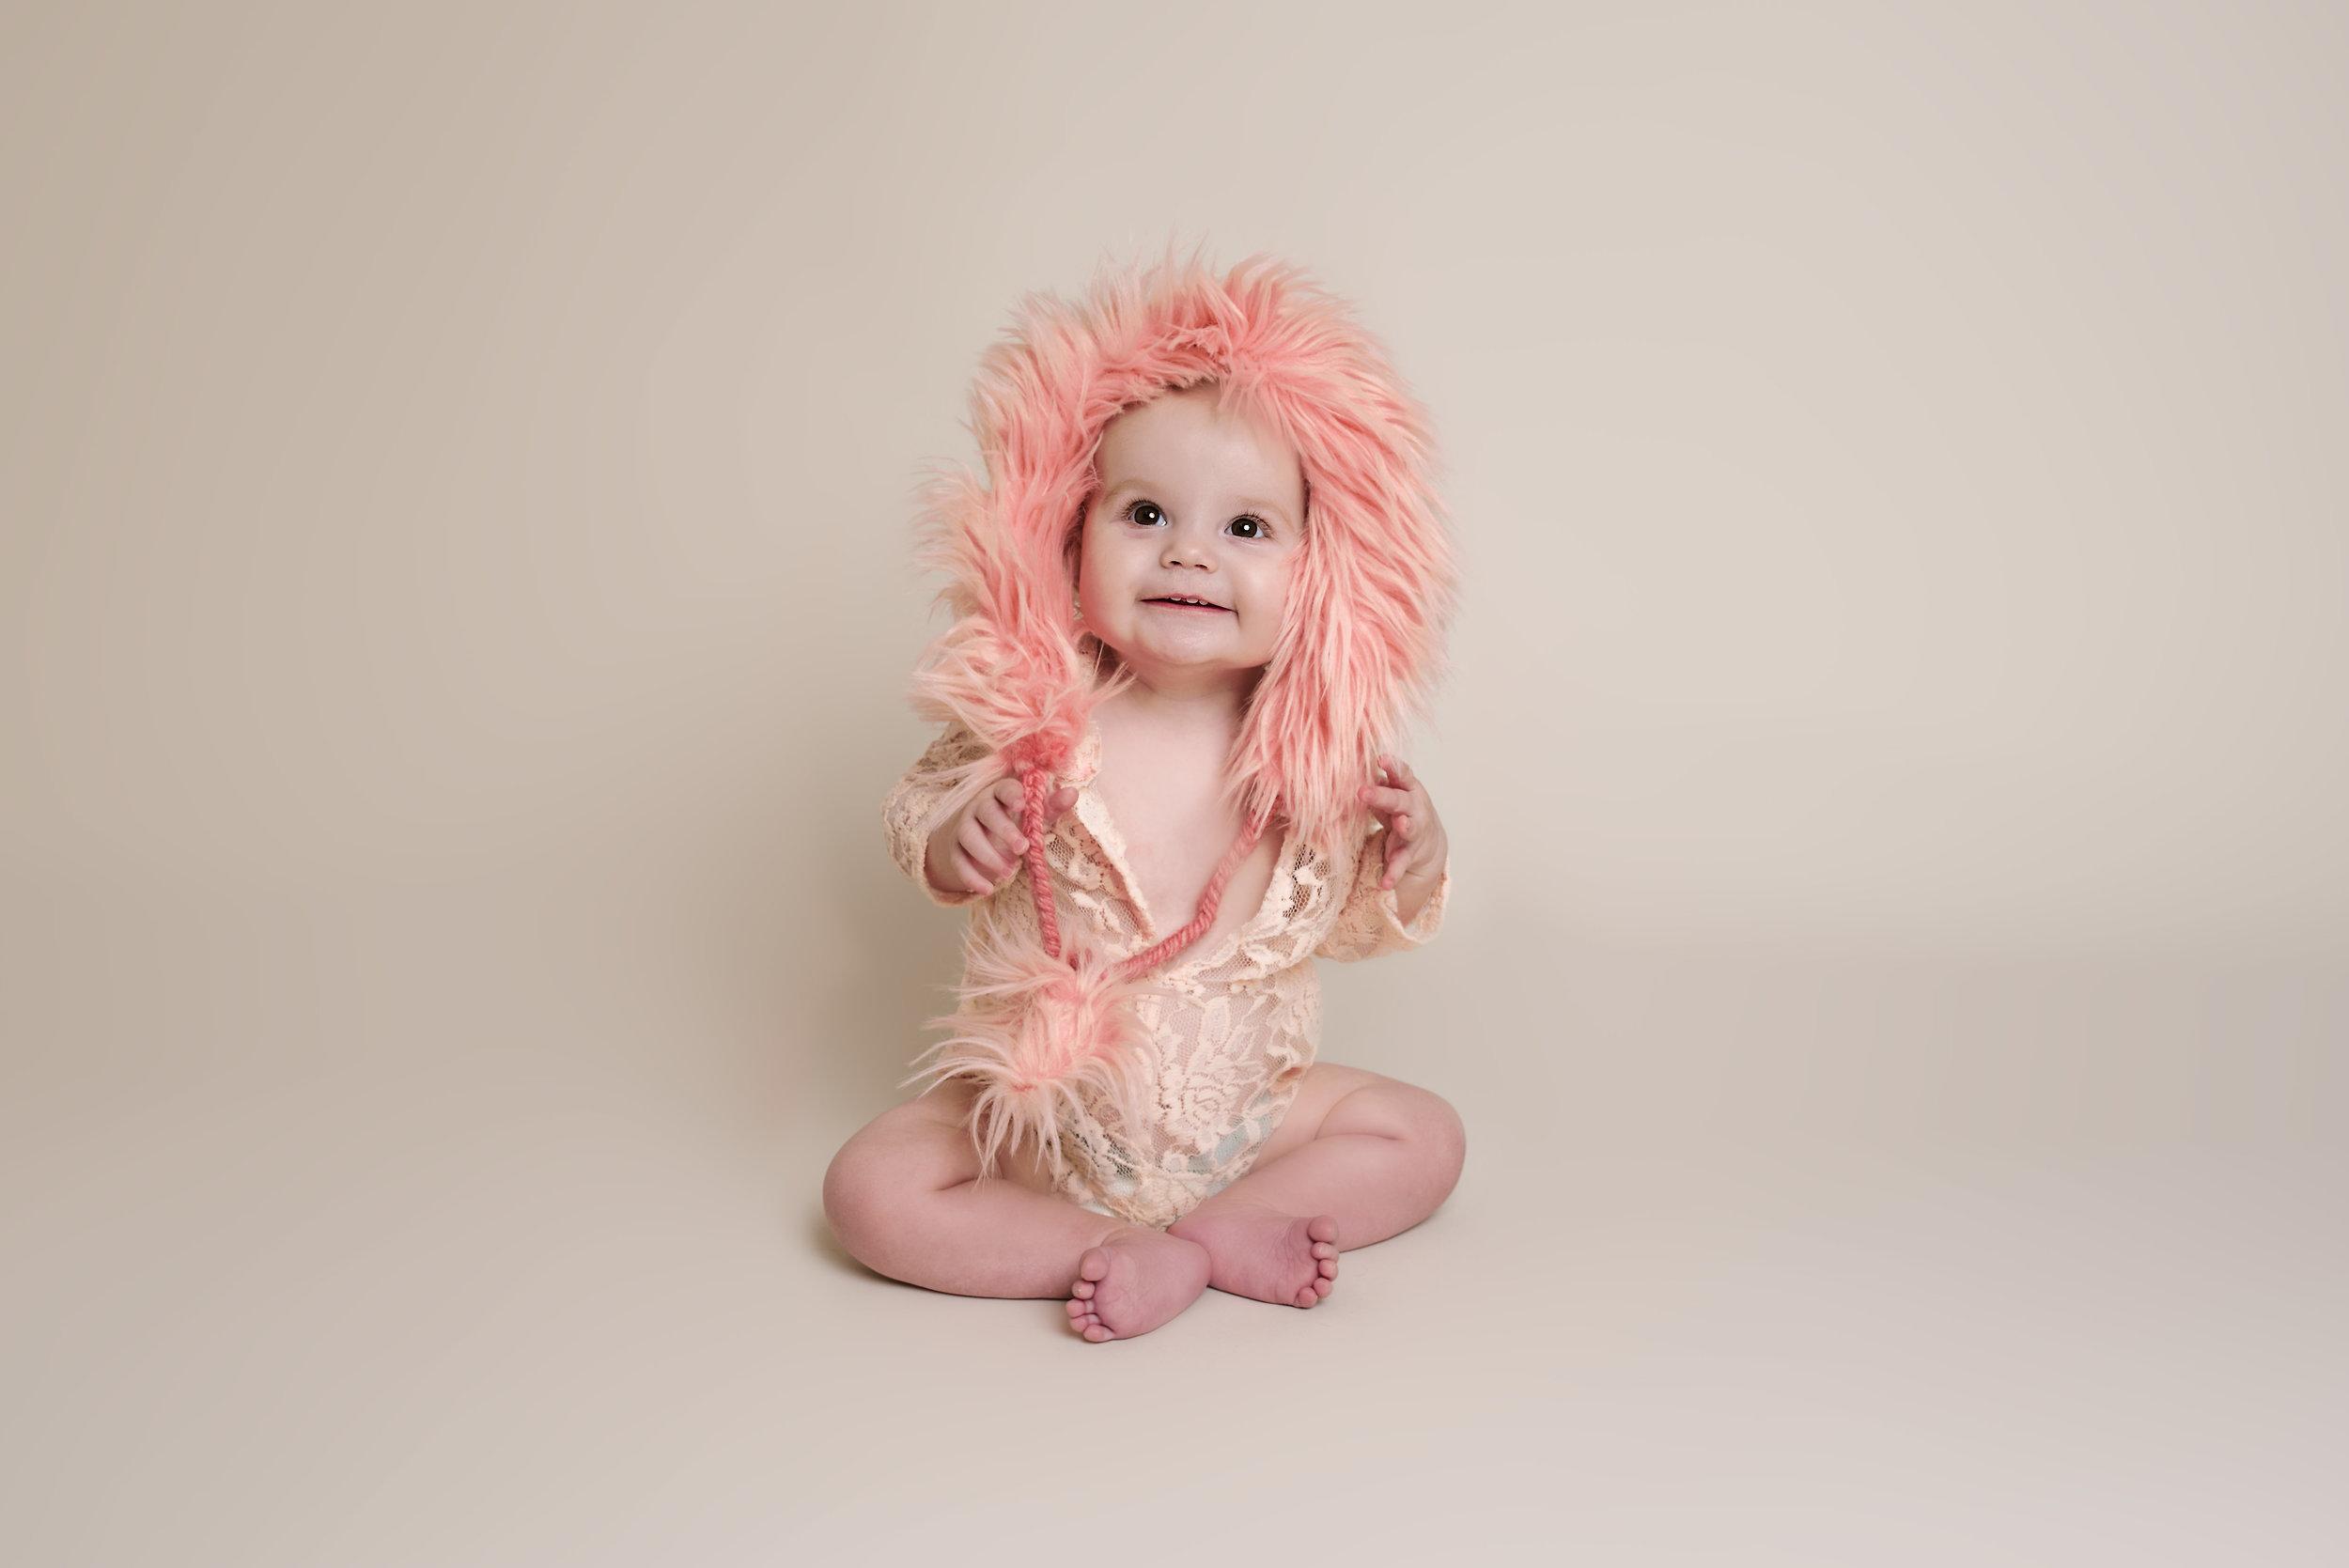 Peach Lace Fur Hooded Romper